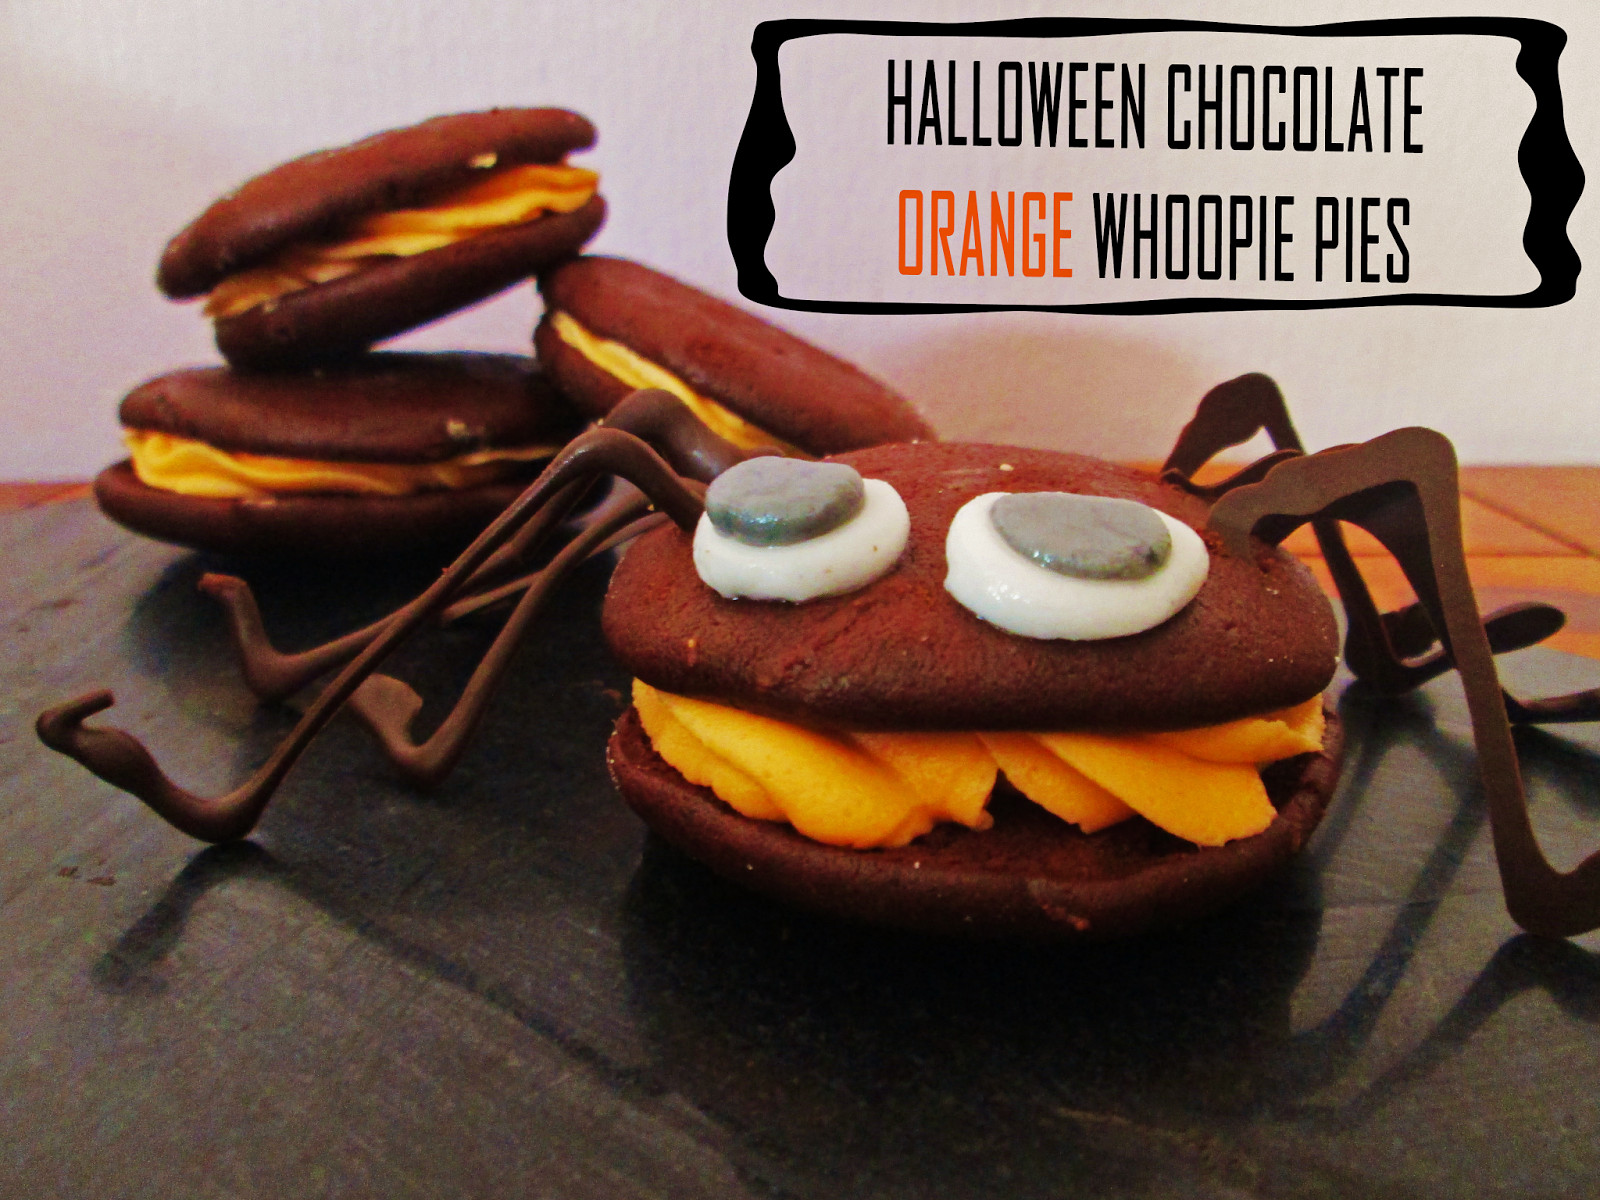 Halloween Whoopie Pies  THE MESSY KITCHEN CHOCOLATE ORANGE WHOOPIE PIES